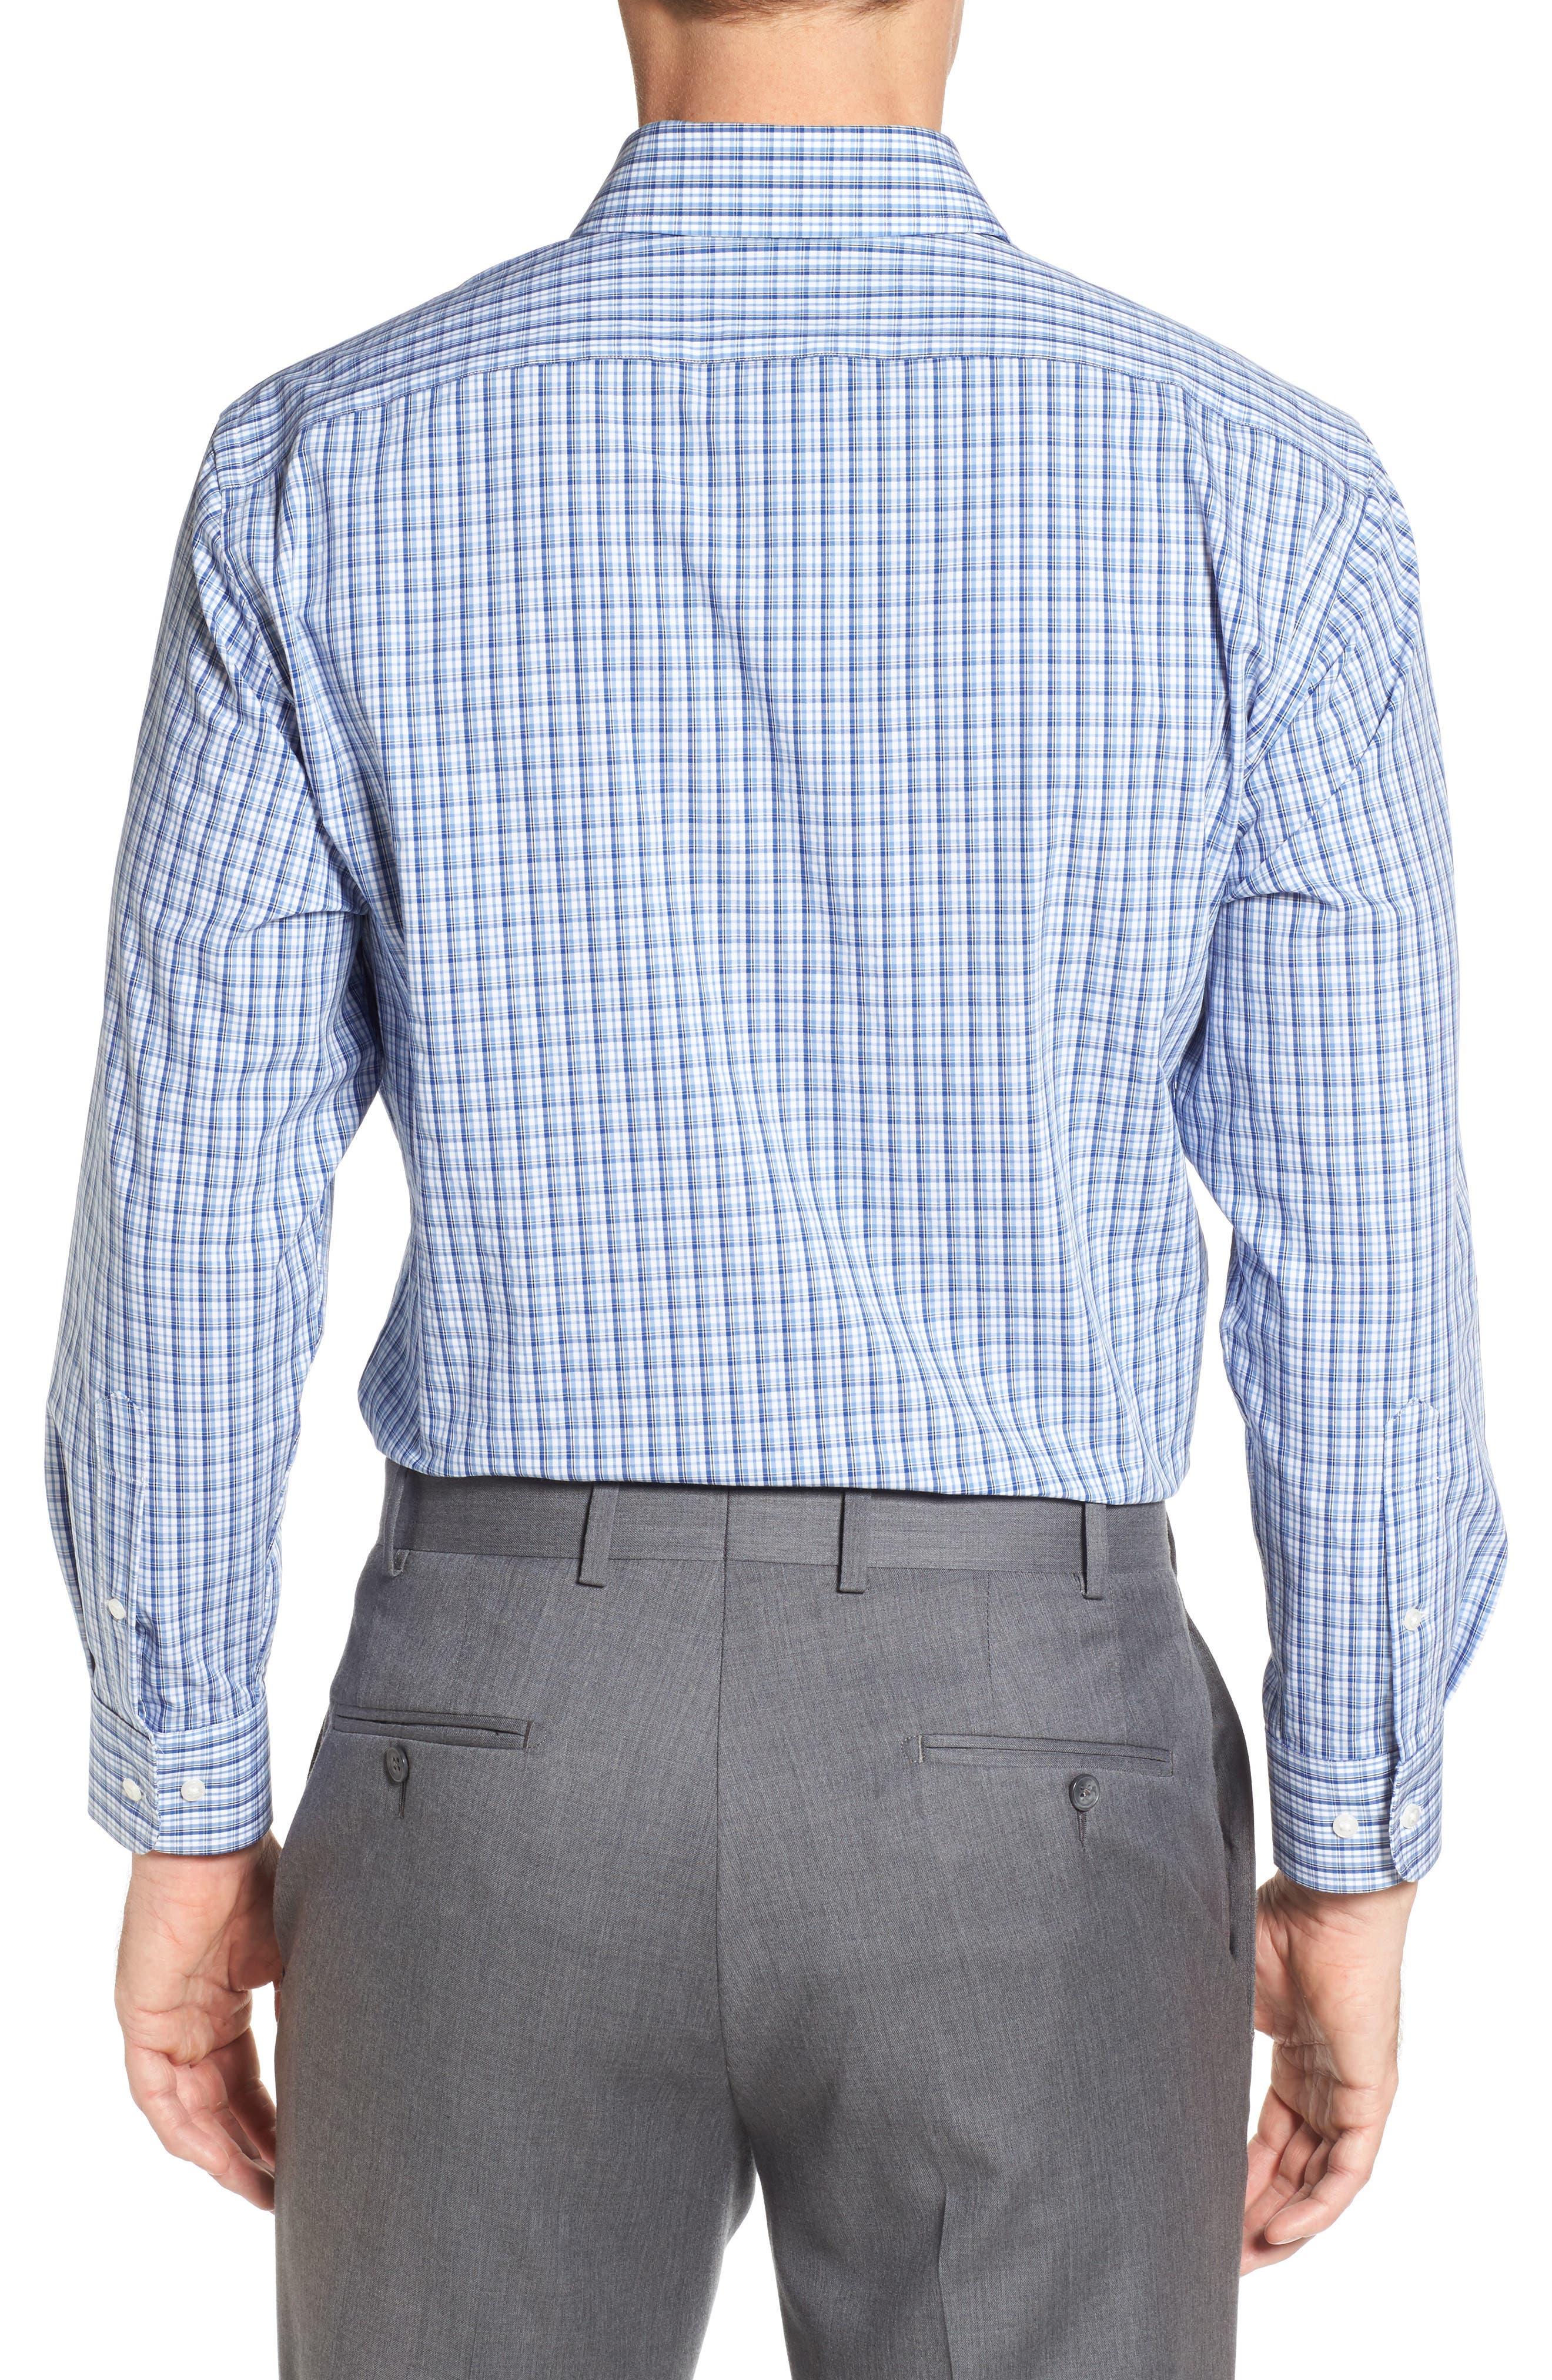 Tech-Smart Traditional Fit Stretch Plaid Dress Shirt,                             Alternate thumbnail 2, color,                             420